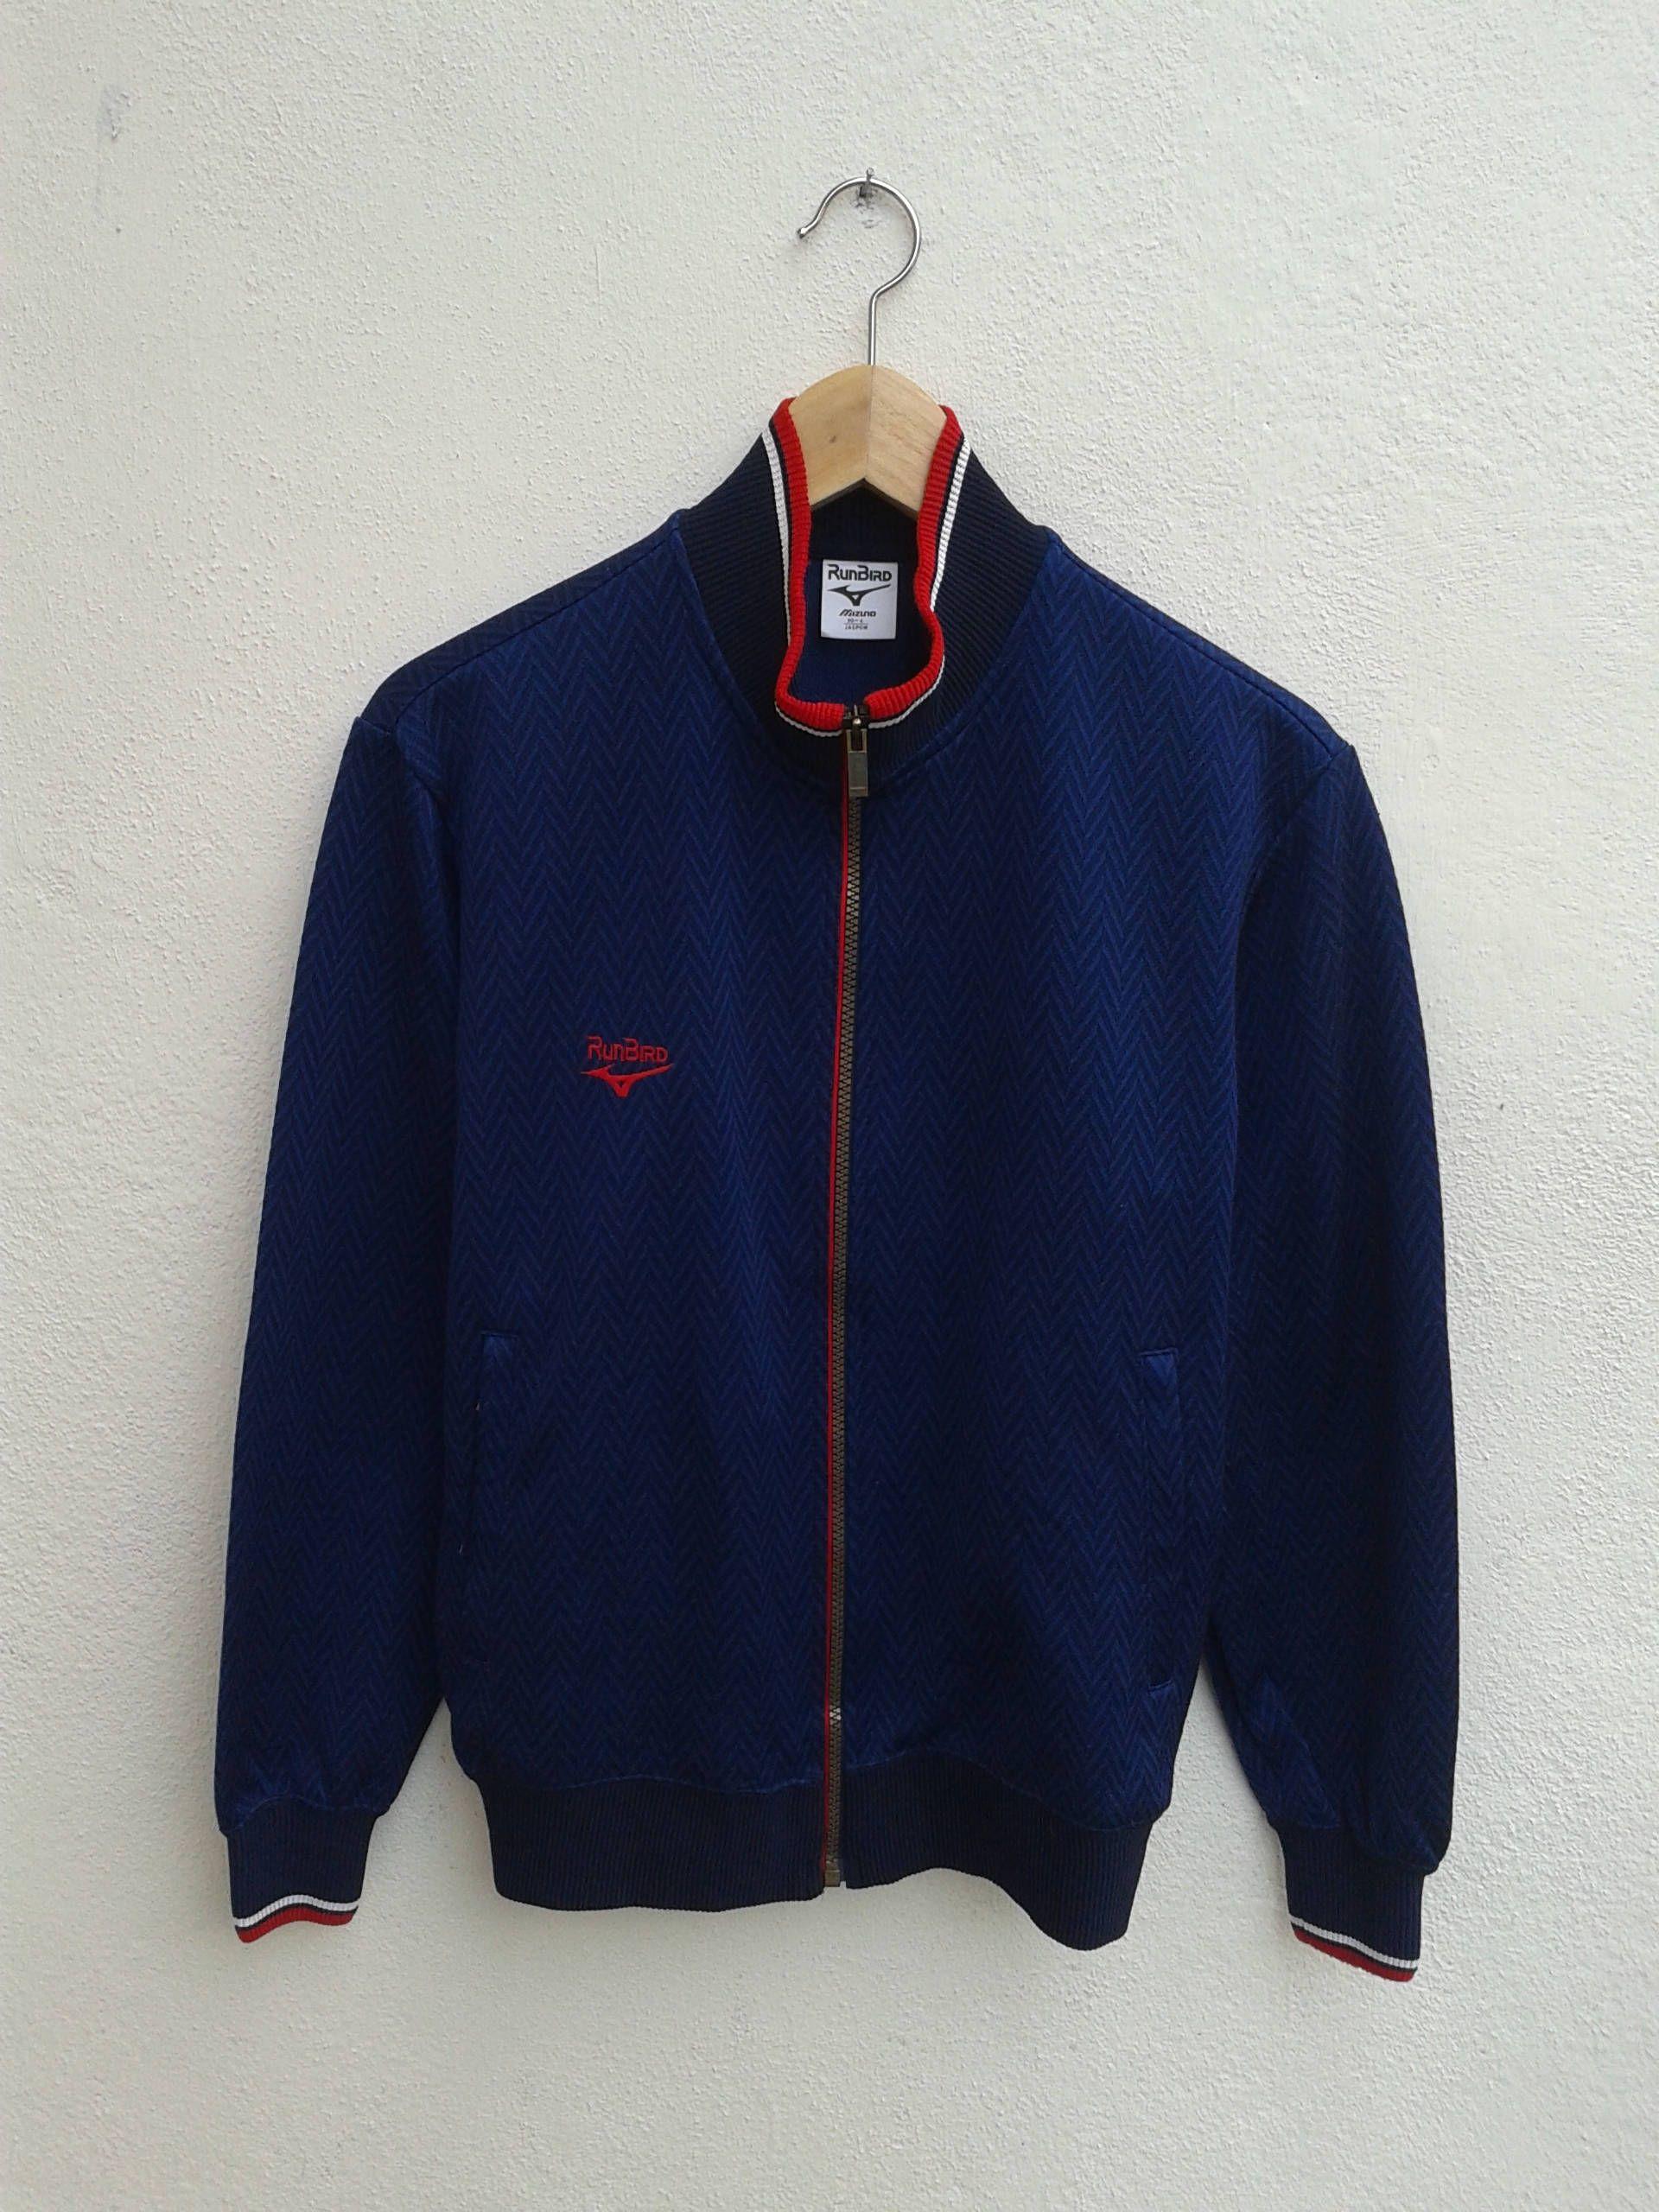 3c9692e0d Vintage 90s RUNBIRD By Mizuno Zipper Jogging Sportswear Classic Pattern  Ring Collar Run Jacket Size M by BubaGumpBudu on Etsy